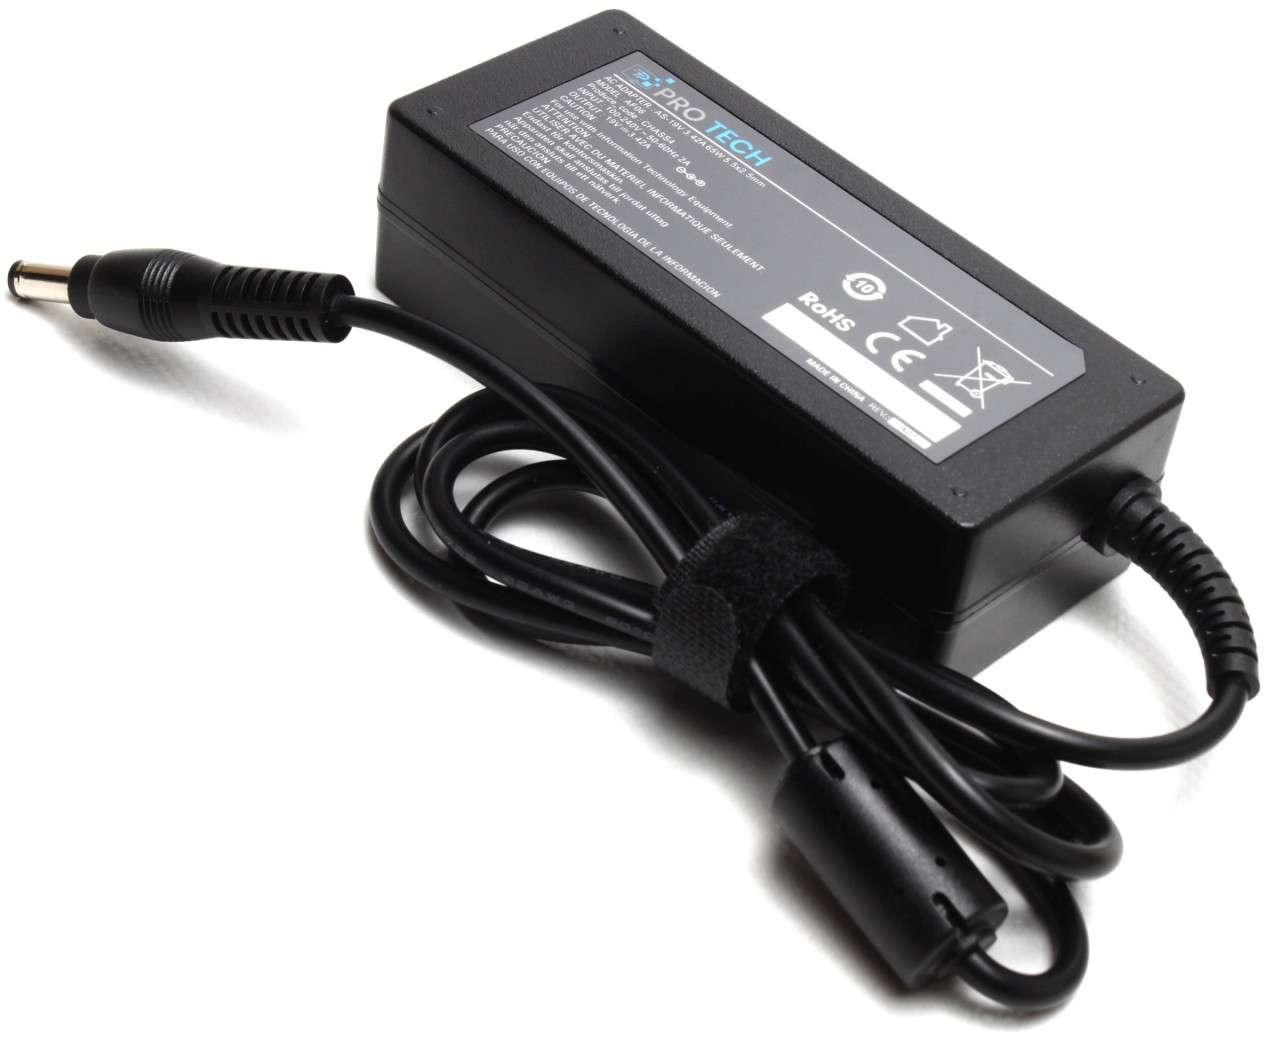 Incarcator MSI PR201 Replacement imagine powerlaptop.ro 2021